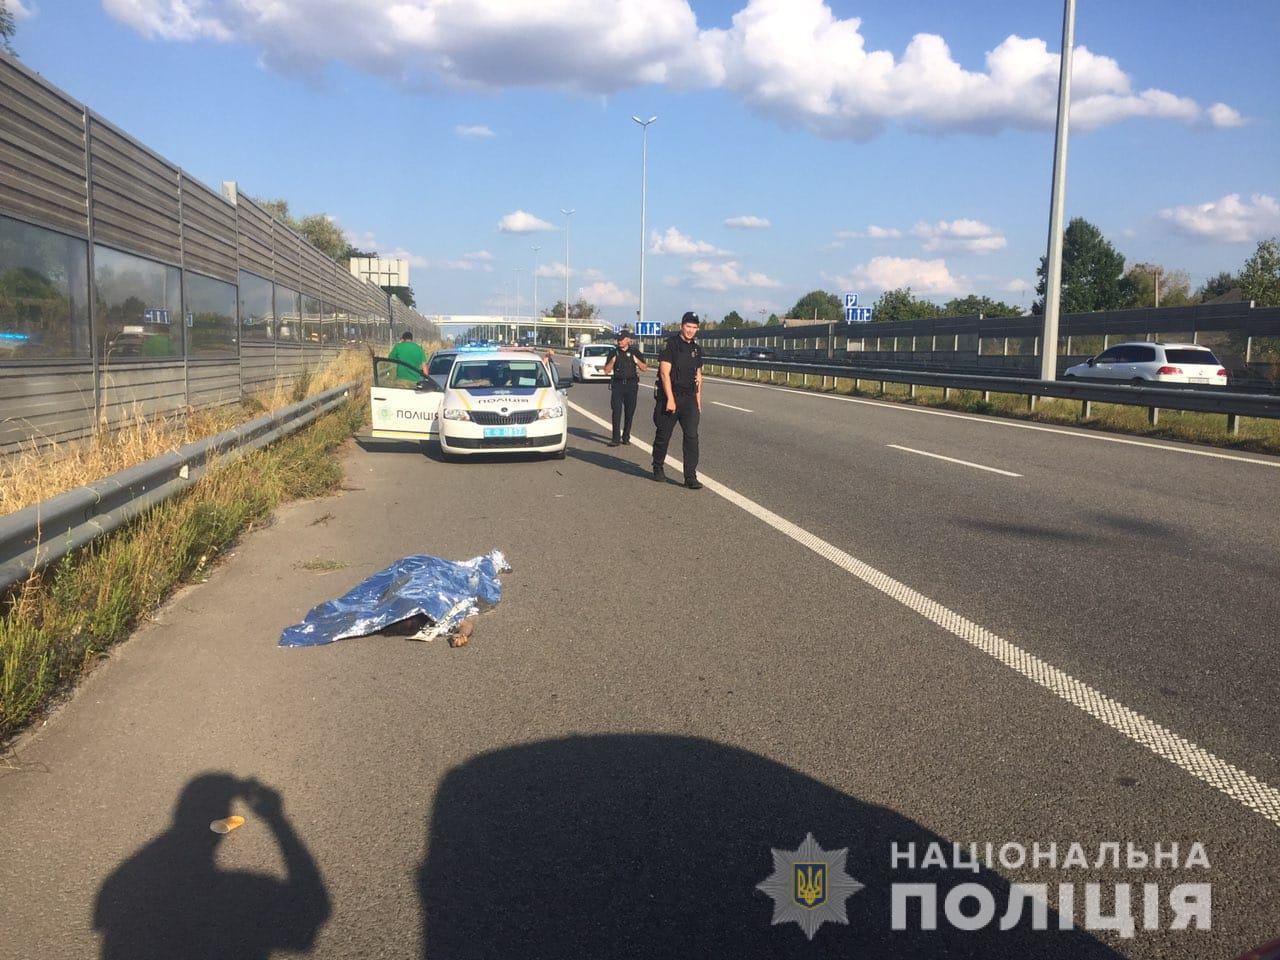 Пешеход погиб на месте происшествия